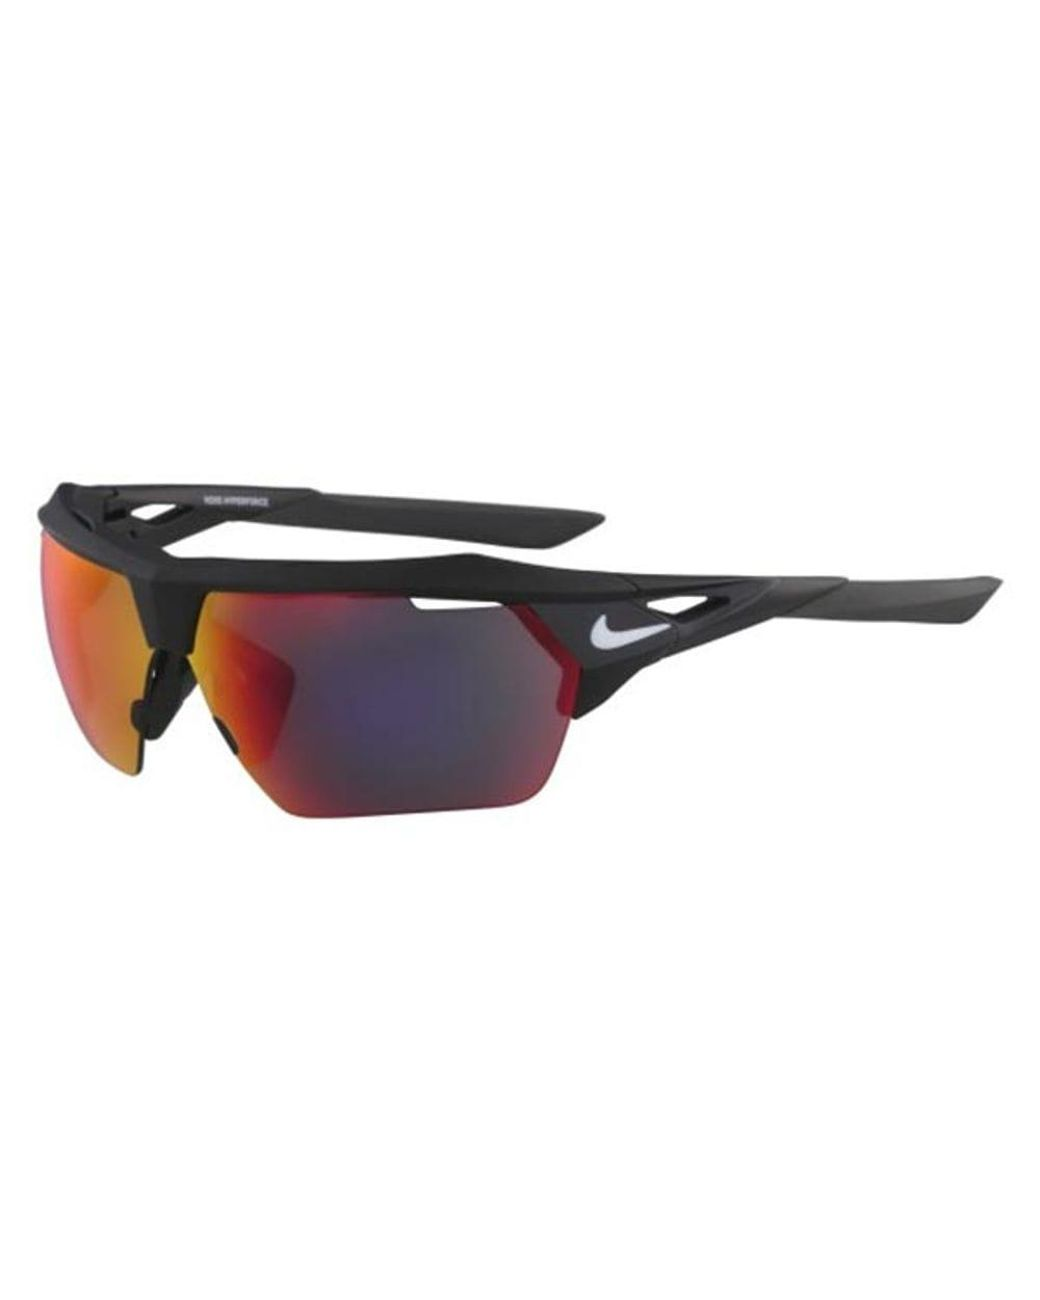 EV1029-021 Mens Nike Hyperforce Sunglasses